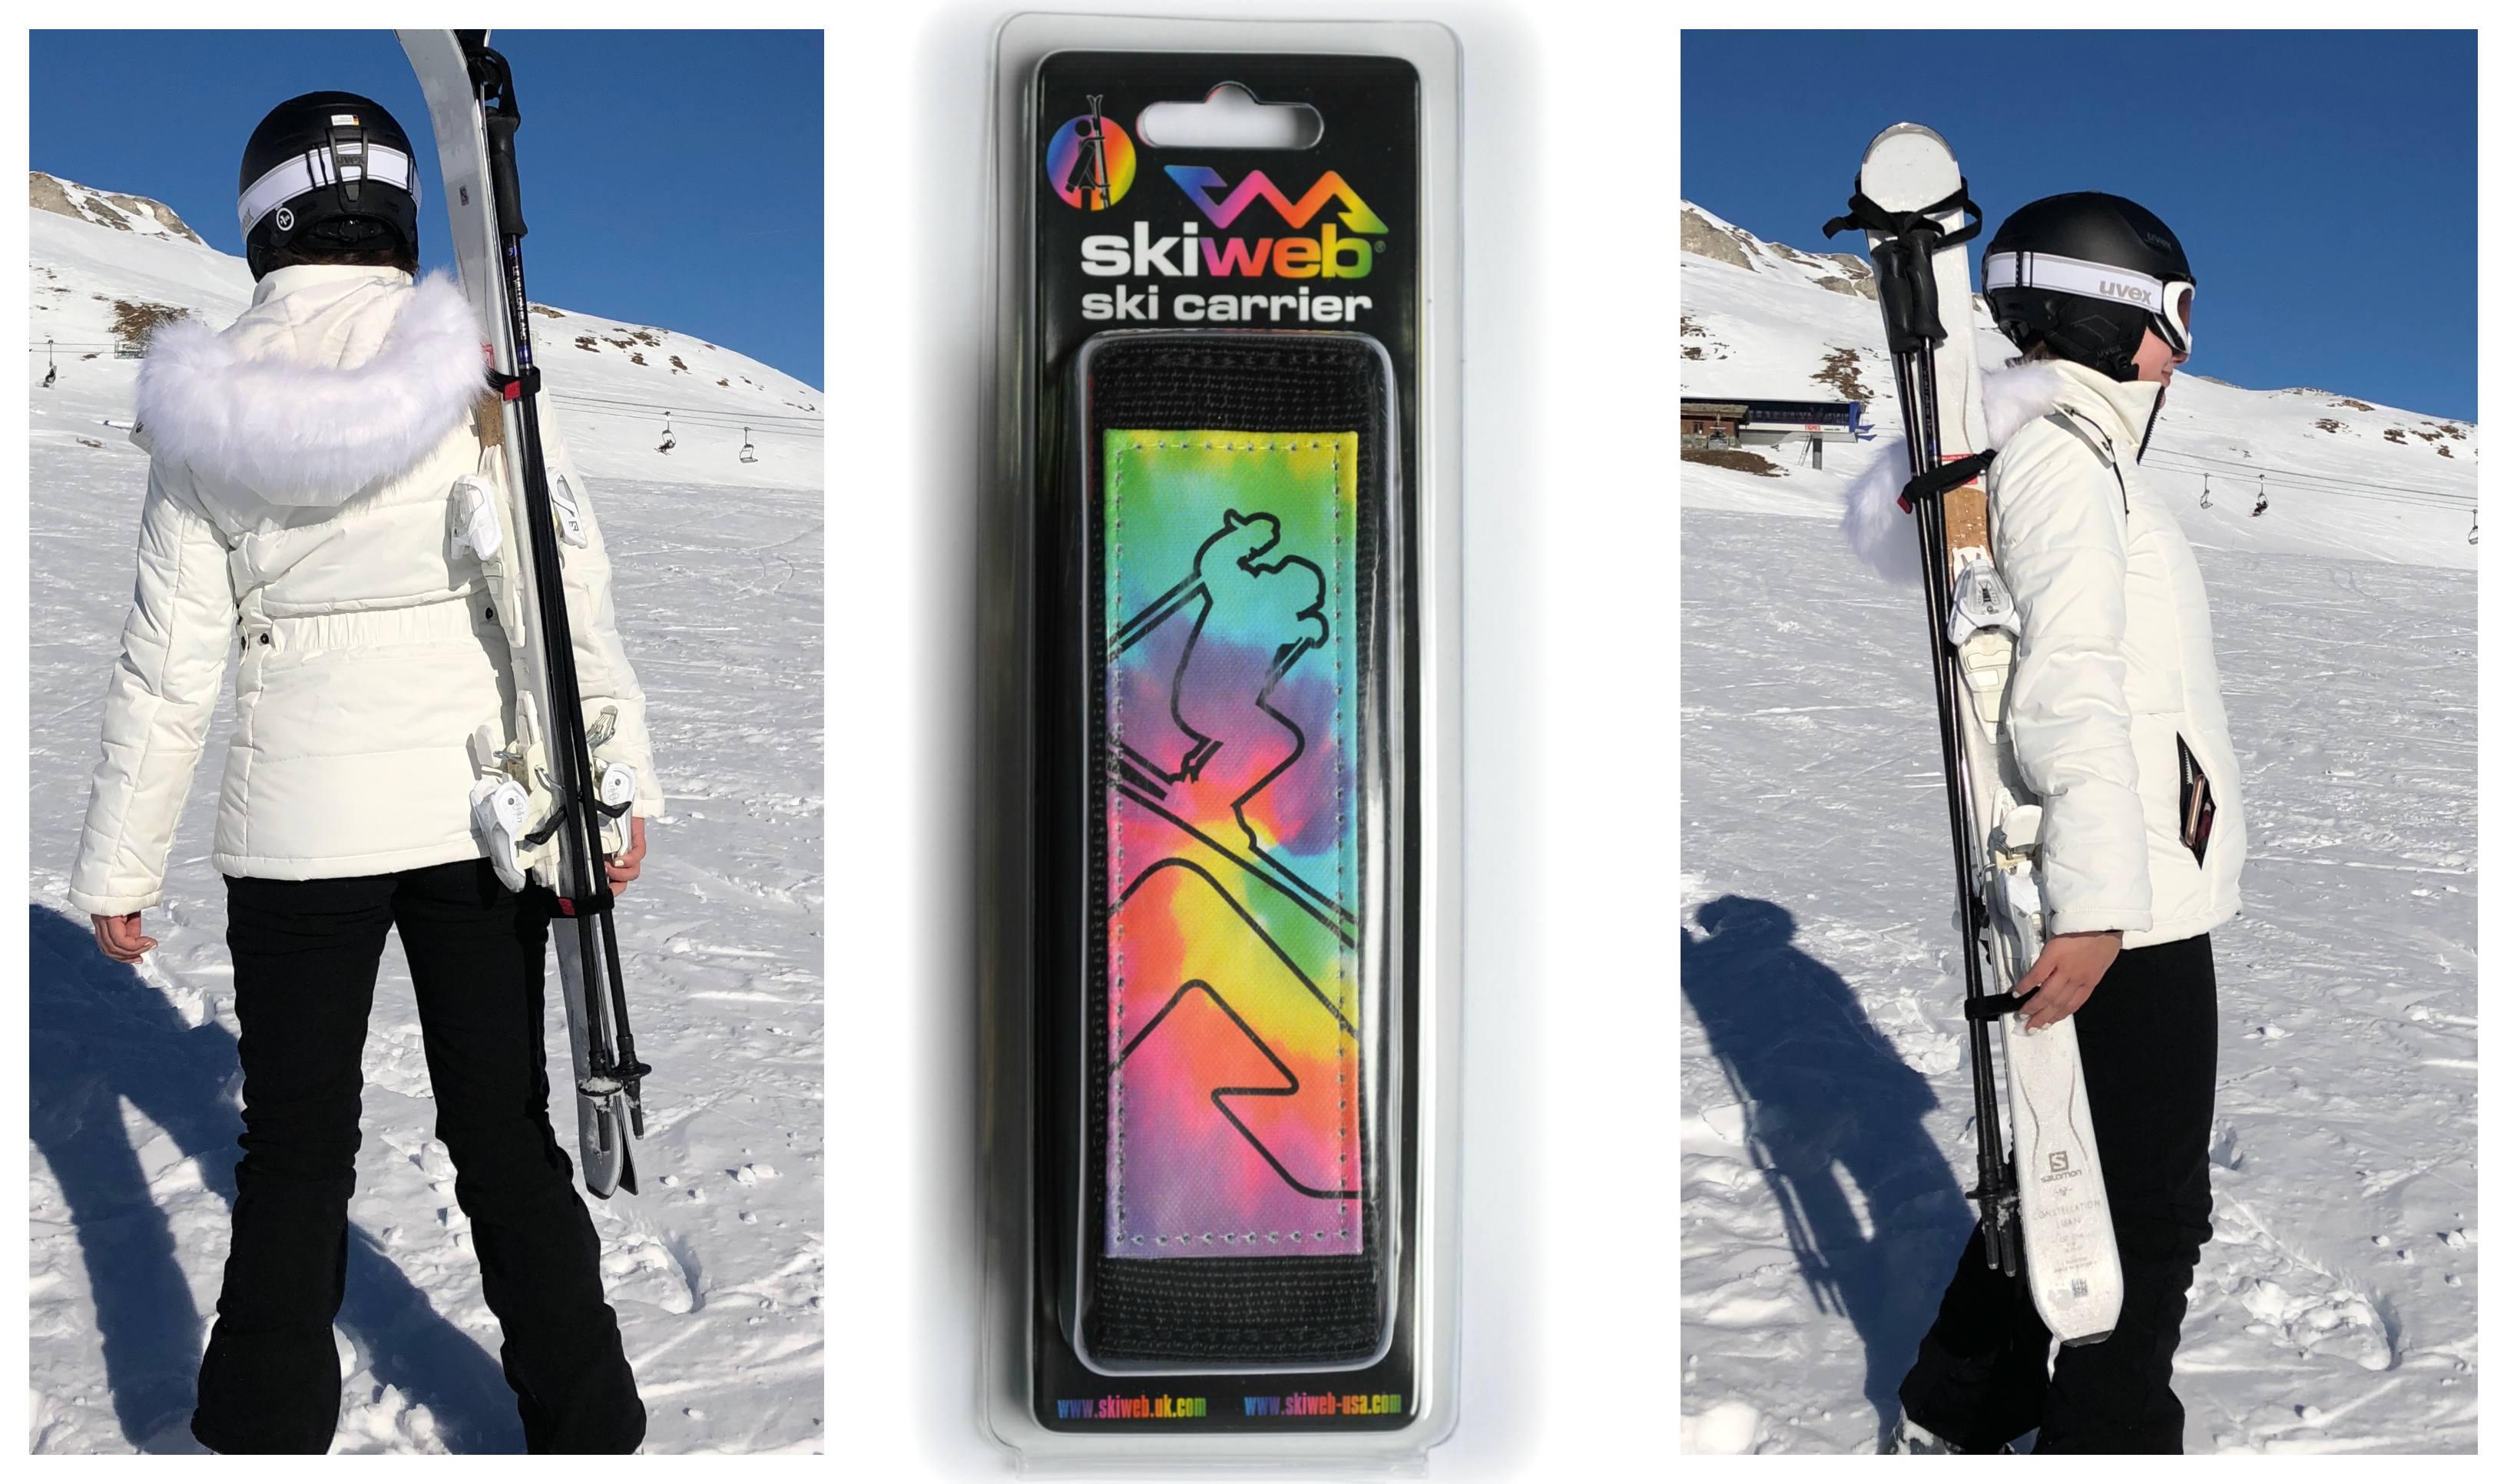 Skiweb Ski Carrier M2019